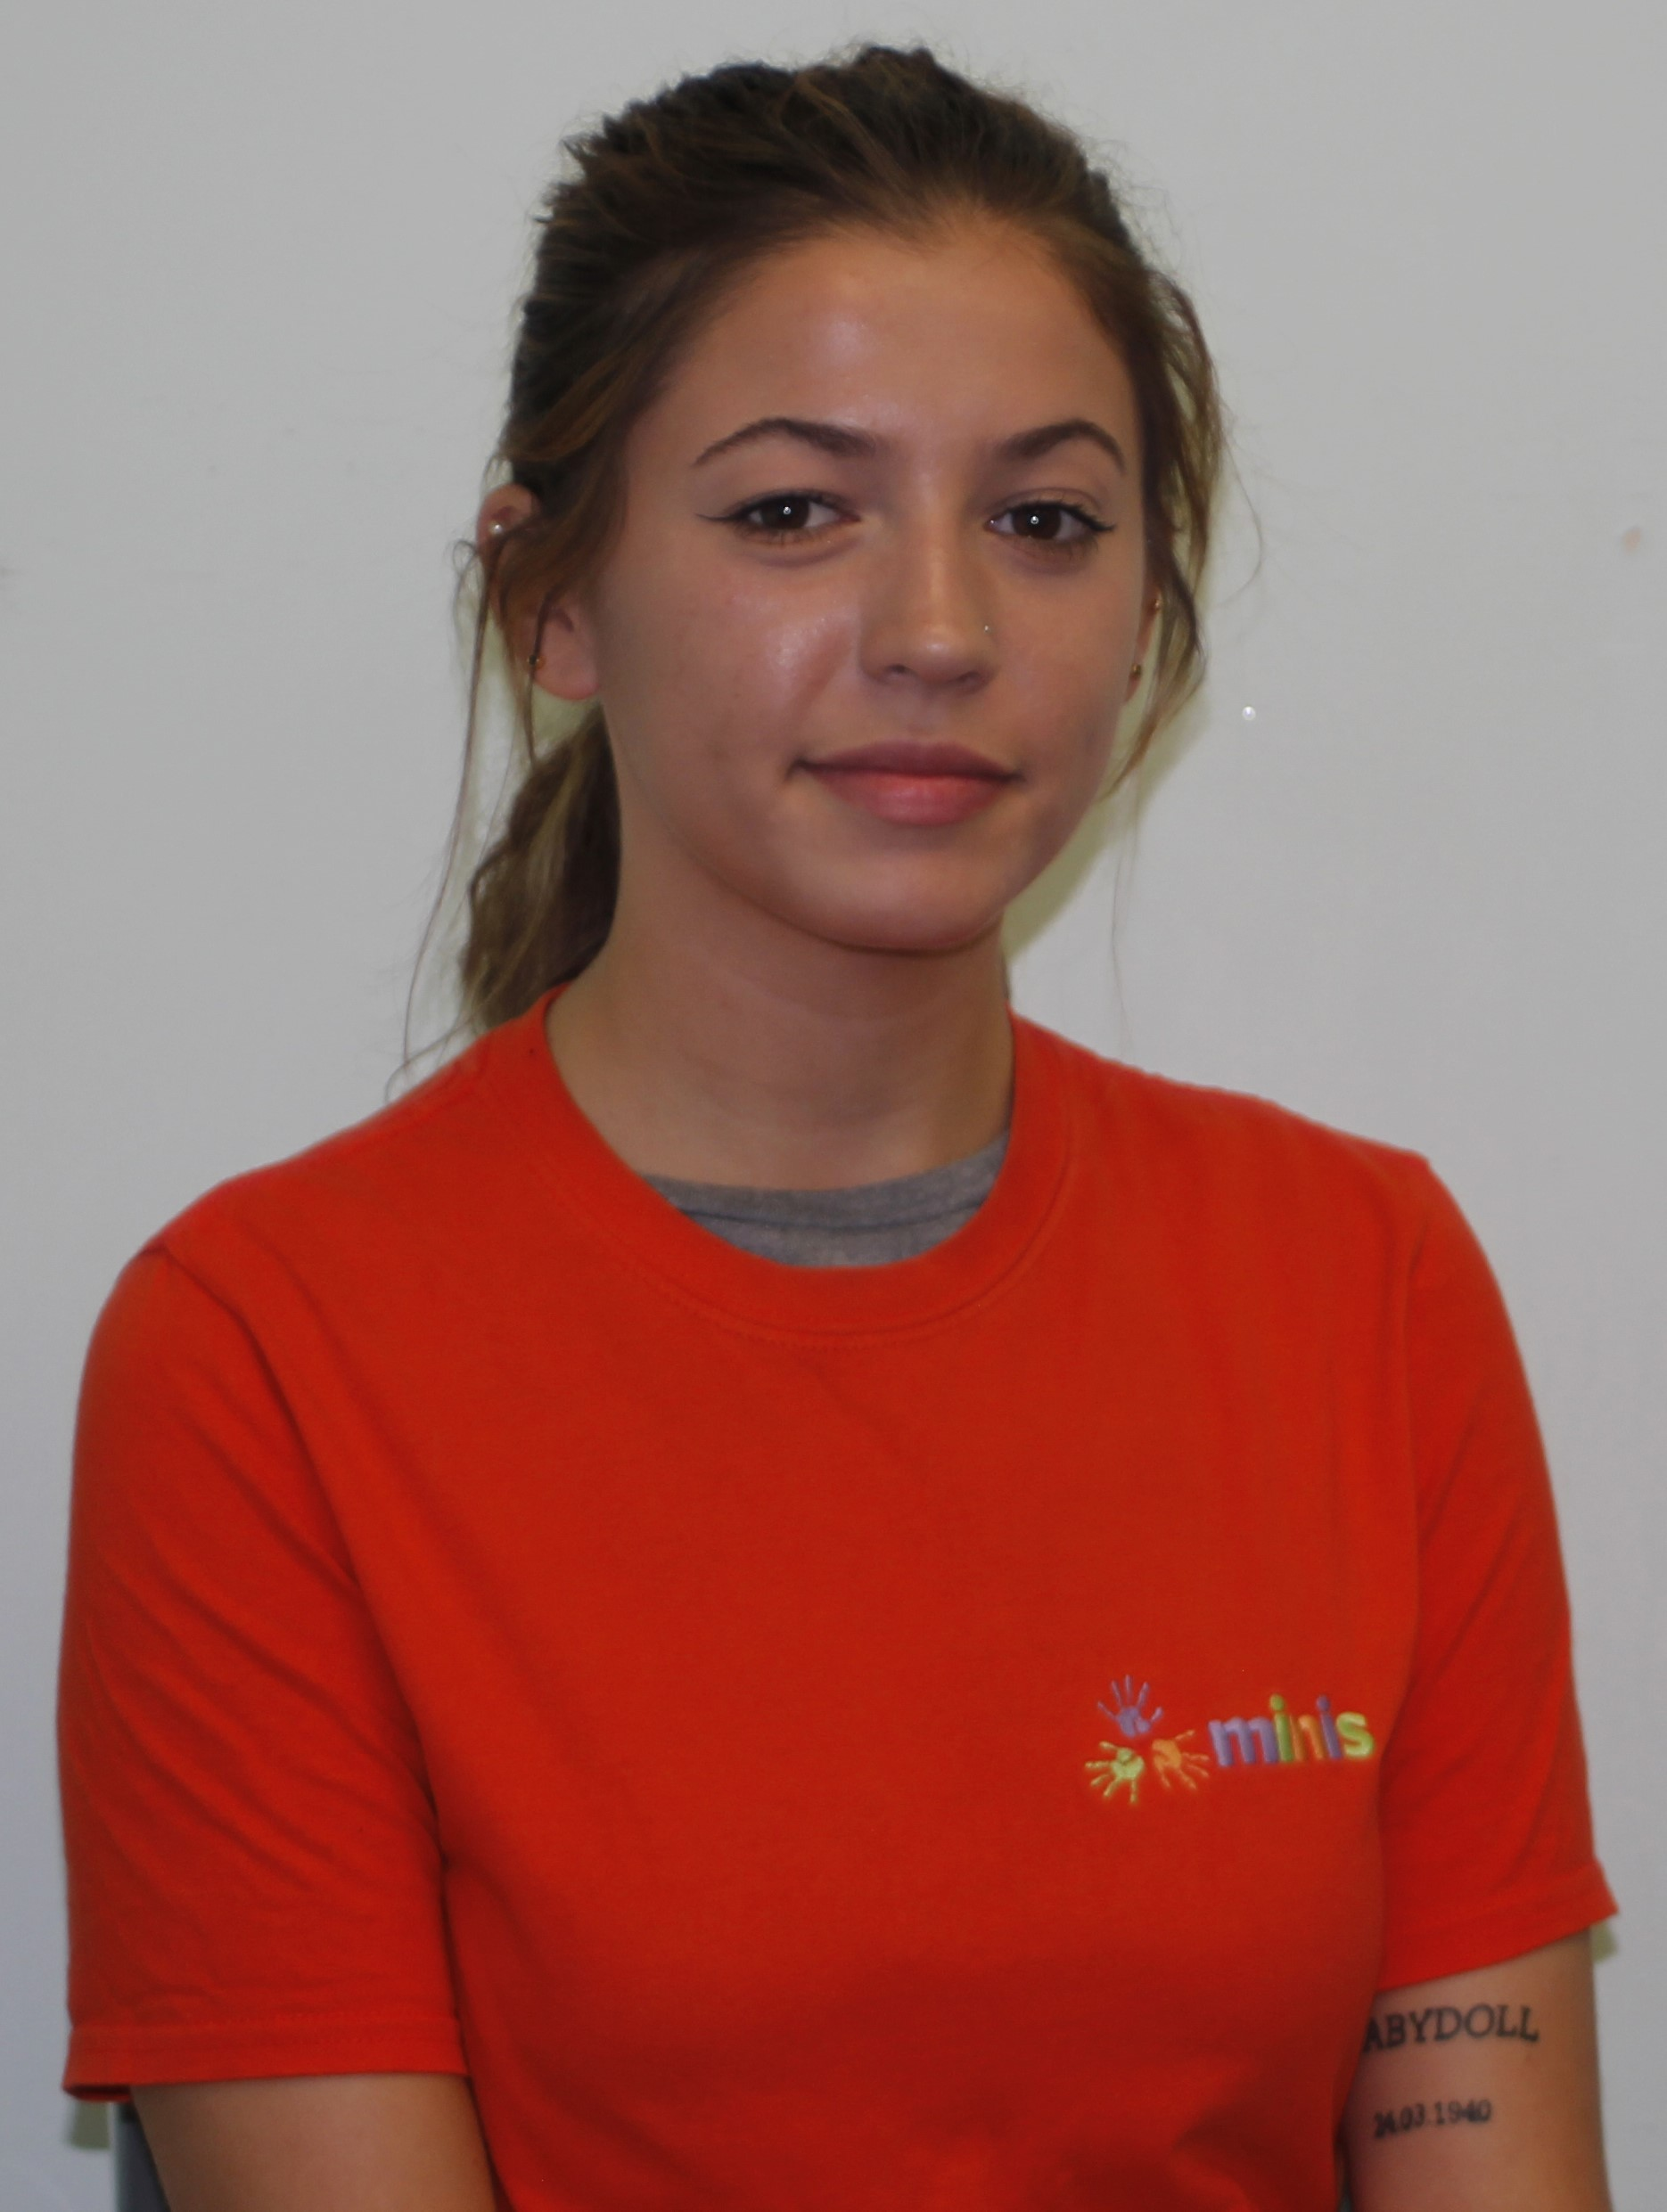 Abigail Hinkley - Lead Teacher